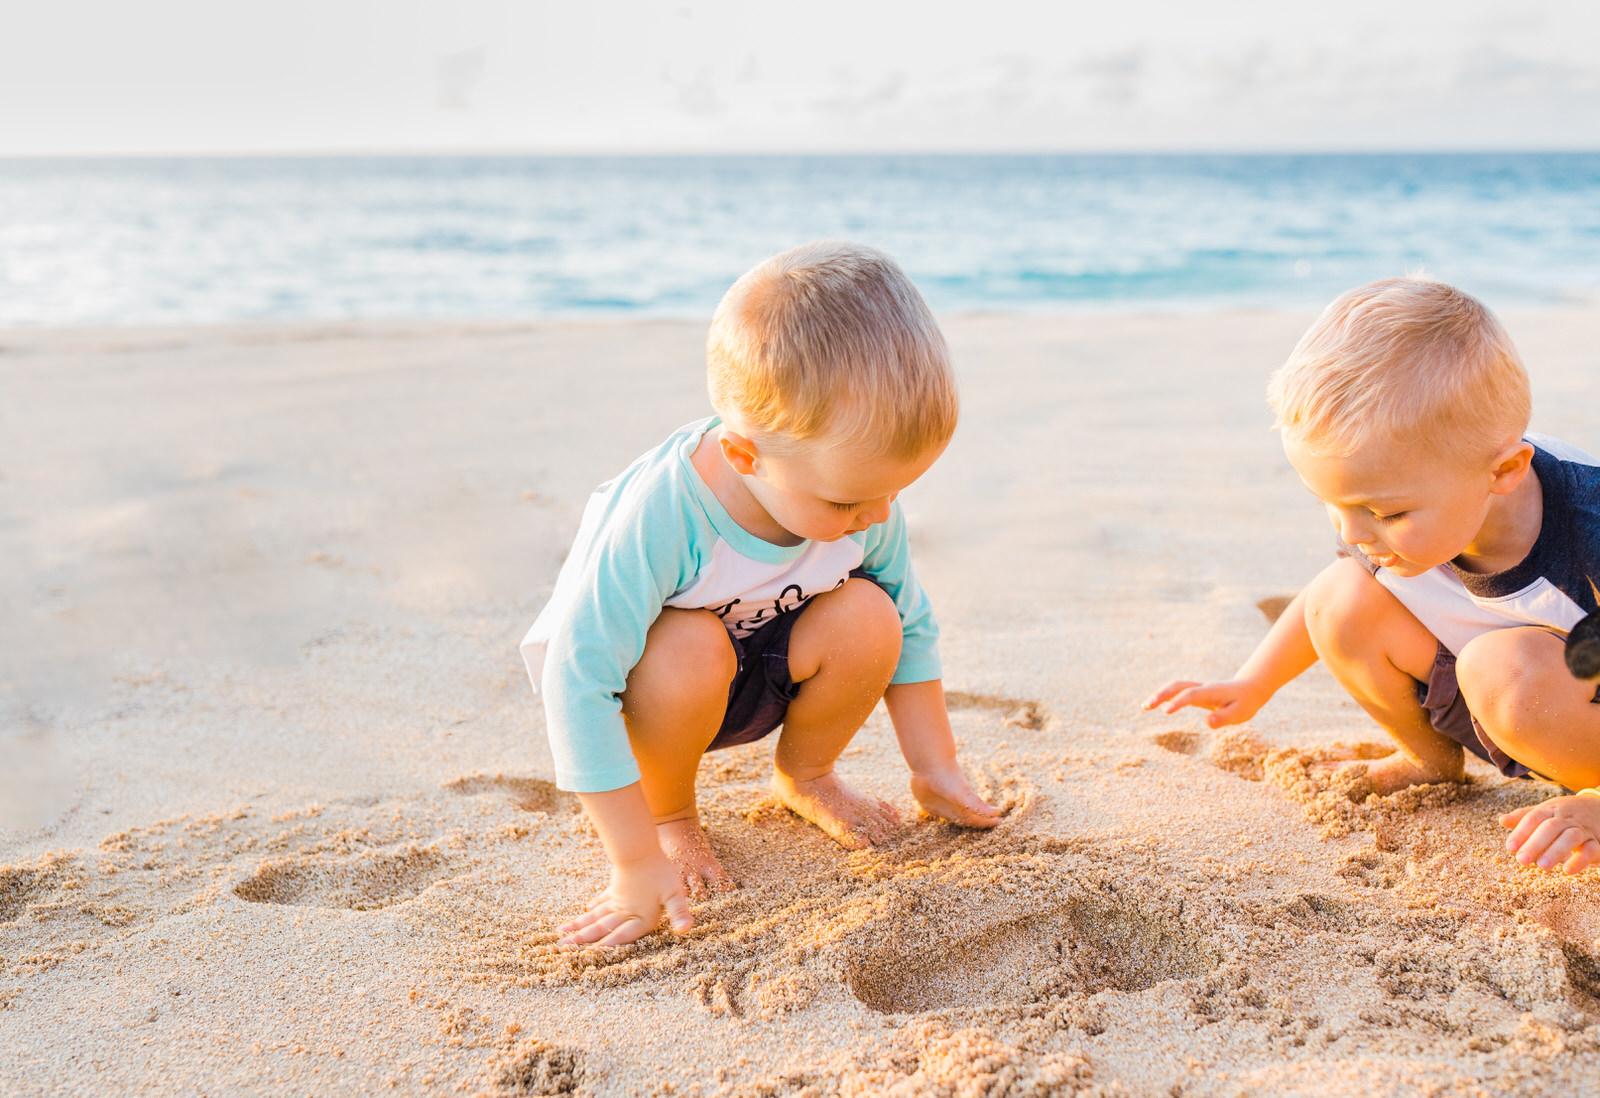 extended-family-big-island-vacation-cousins-grandparents-beach-waikoloa-sunset-hawaii-7195.jpg